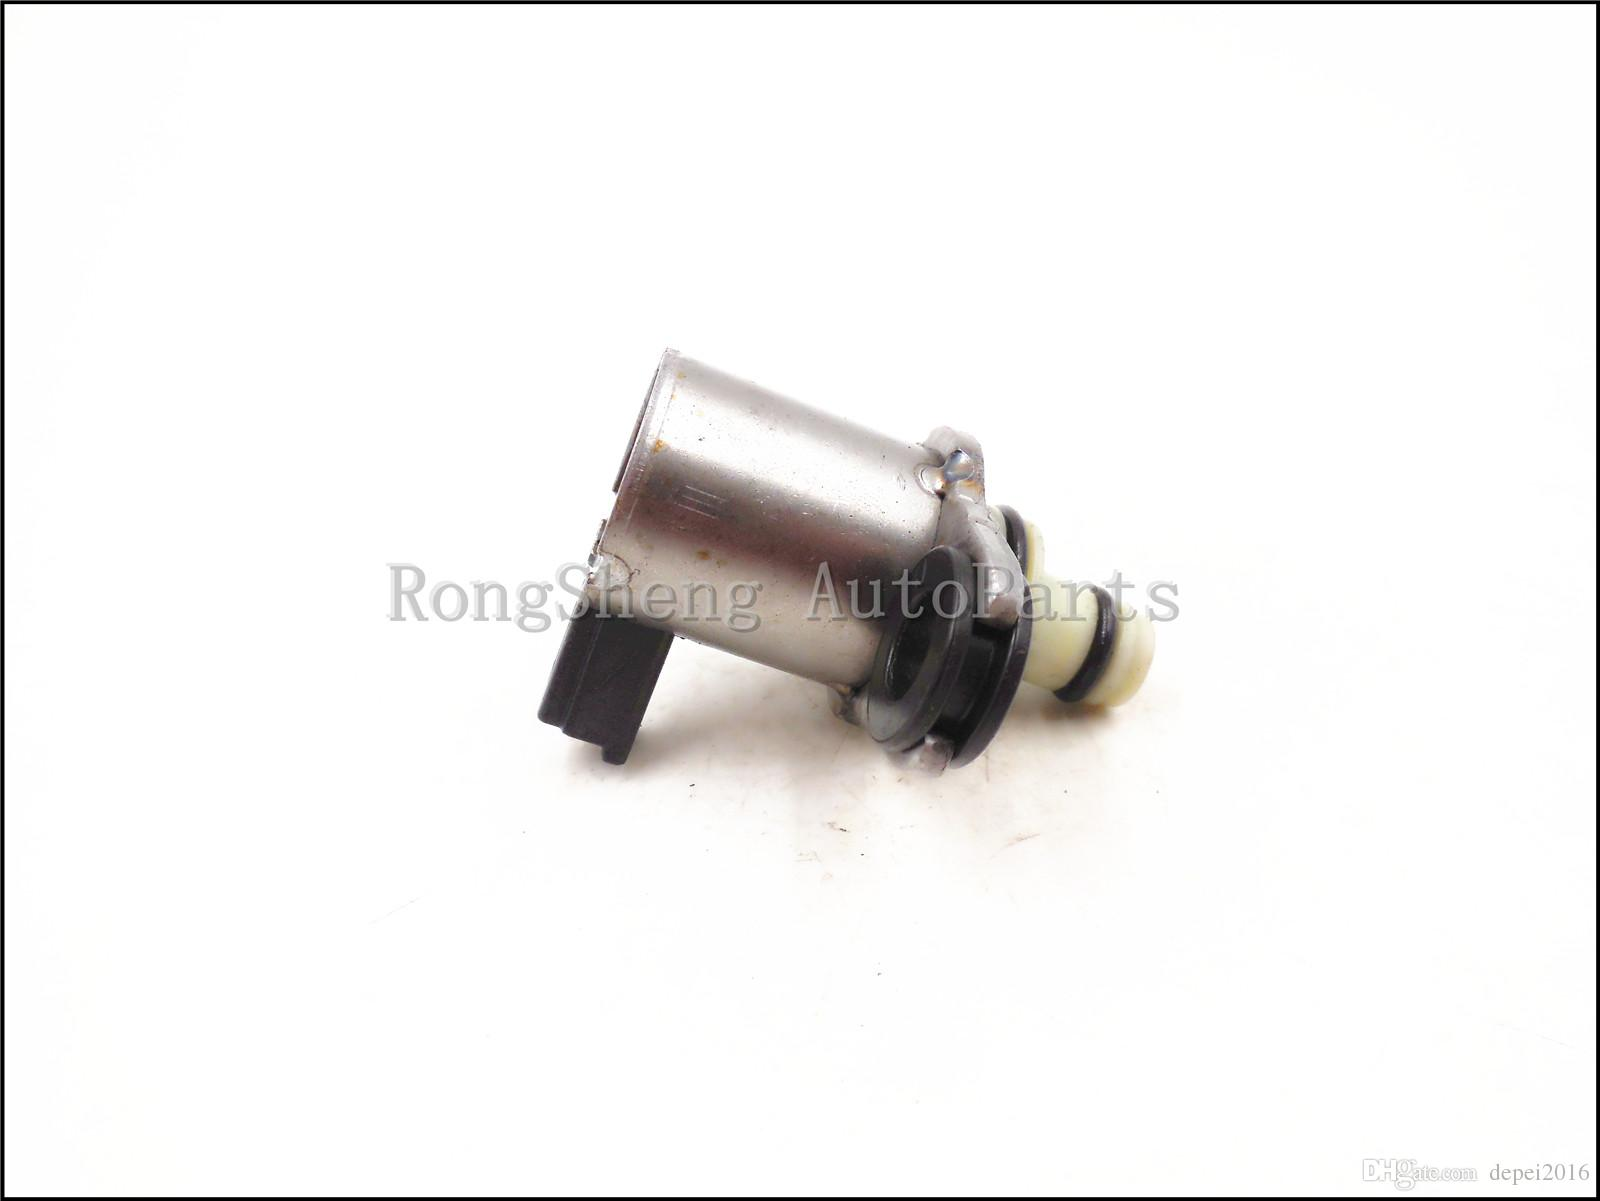 MITSUBISHI 변속기 용 솔레노이드 밸브 OEM G7T12074